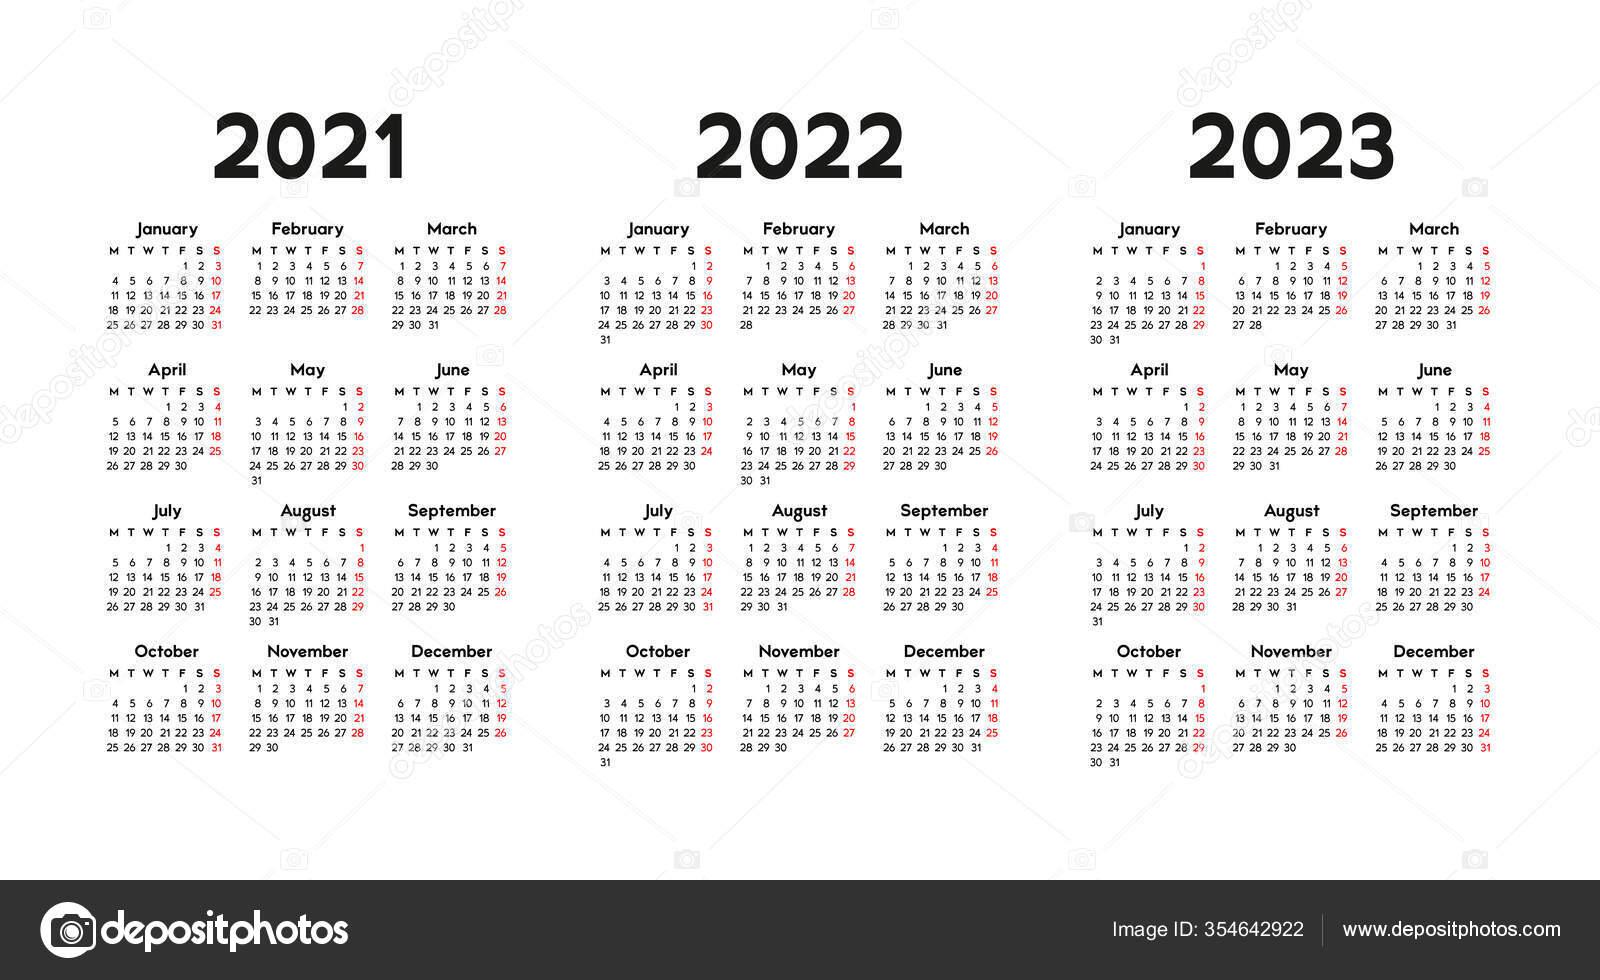 2023 And 2022 Calendar.Calendar 2021 2022 2023 Week Starts Monday Basic Business Template Vector Image By C Xennya Vector Stock 354642922